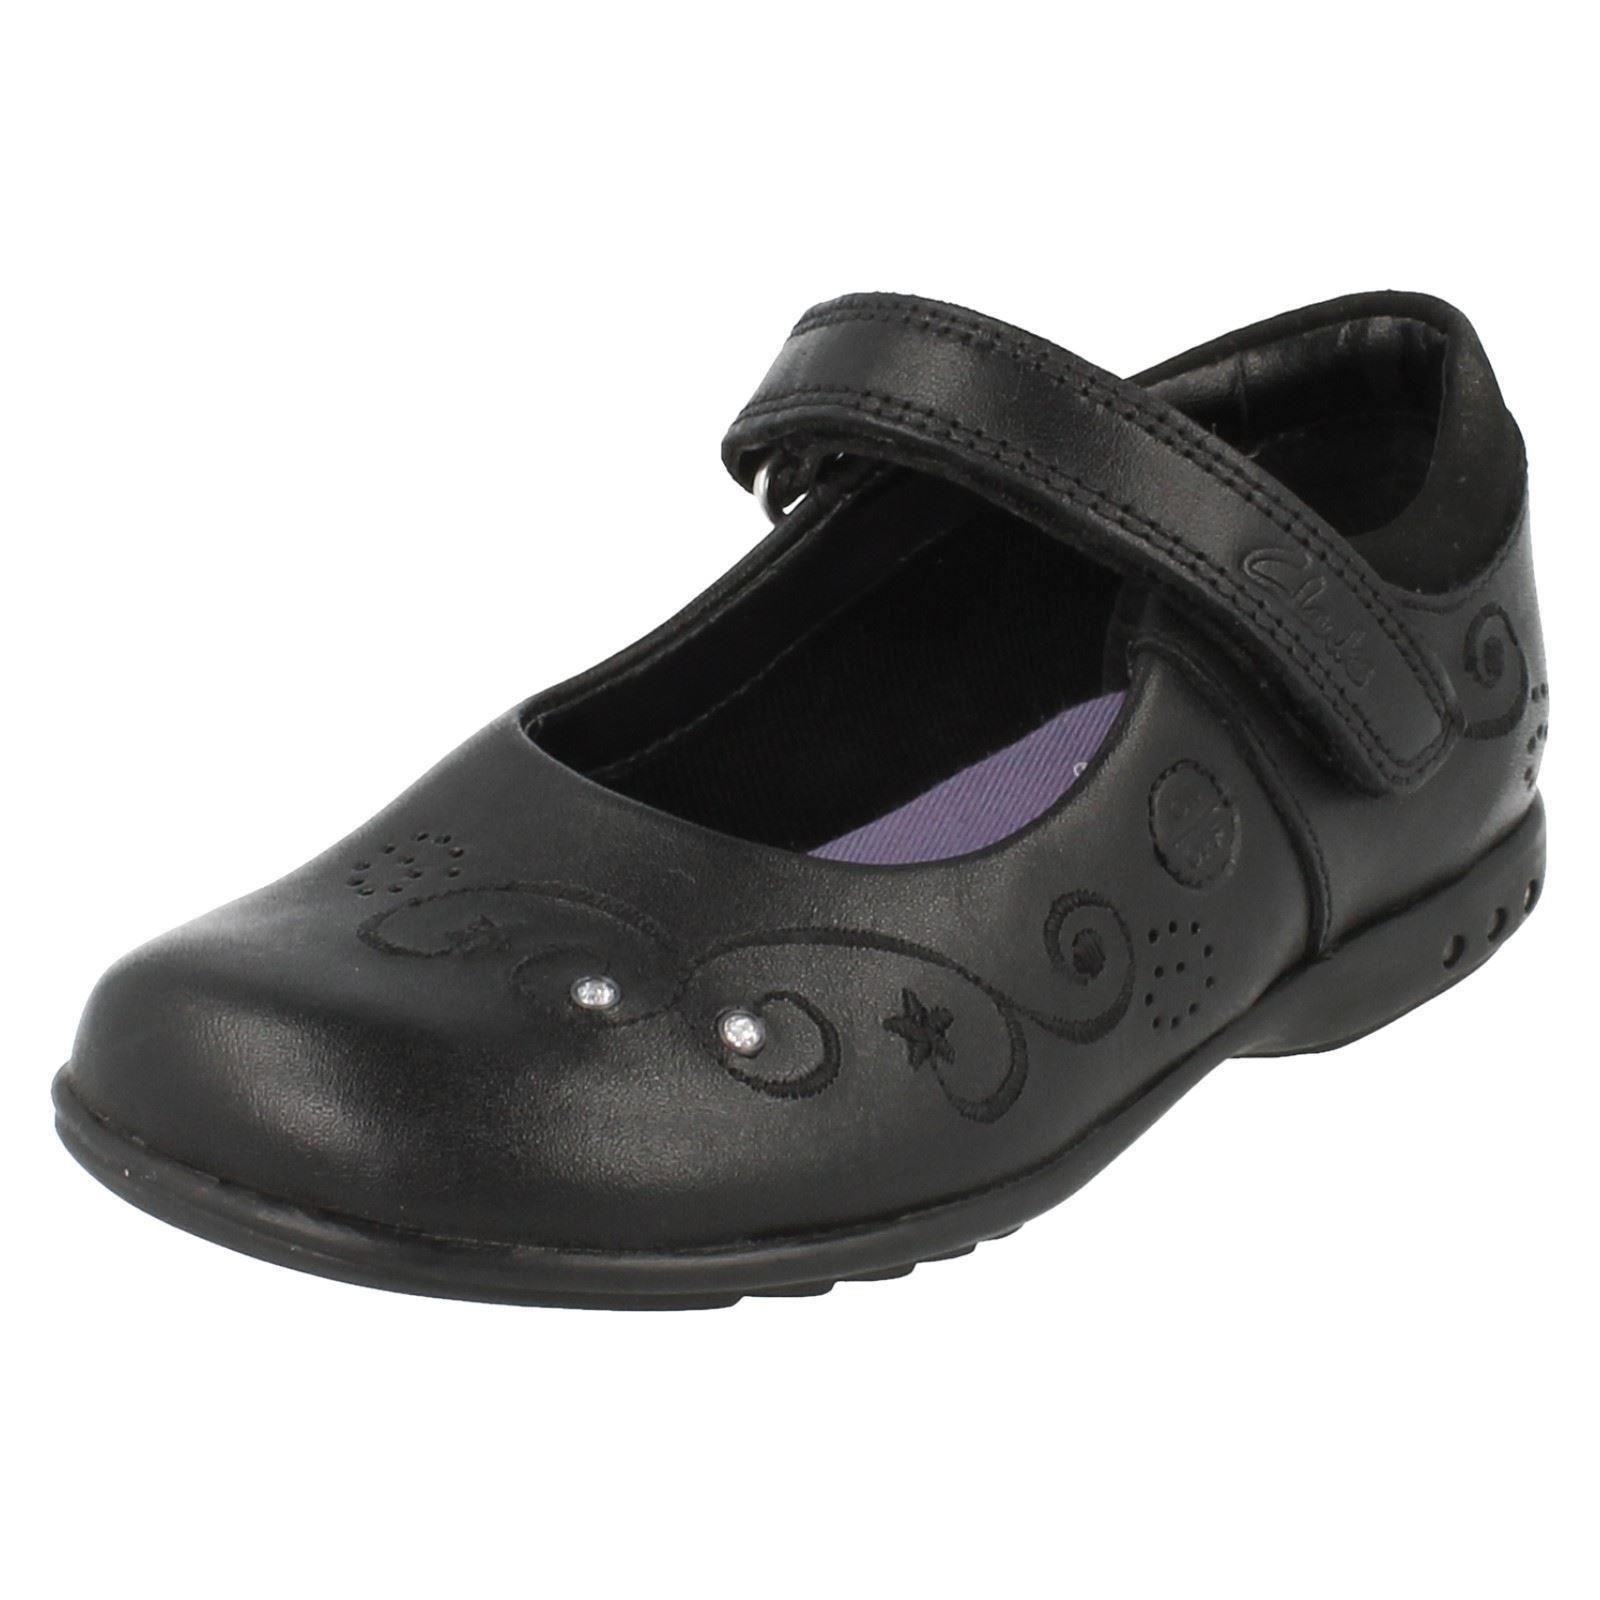 Girls Clarks Light Up School Shoes G Fit 'Breenajo' Label ~ K